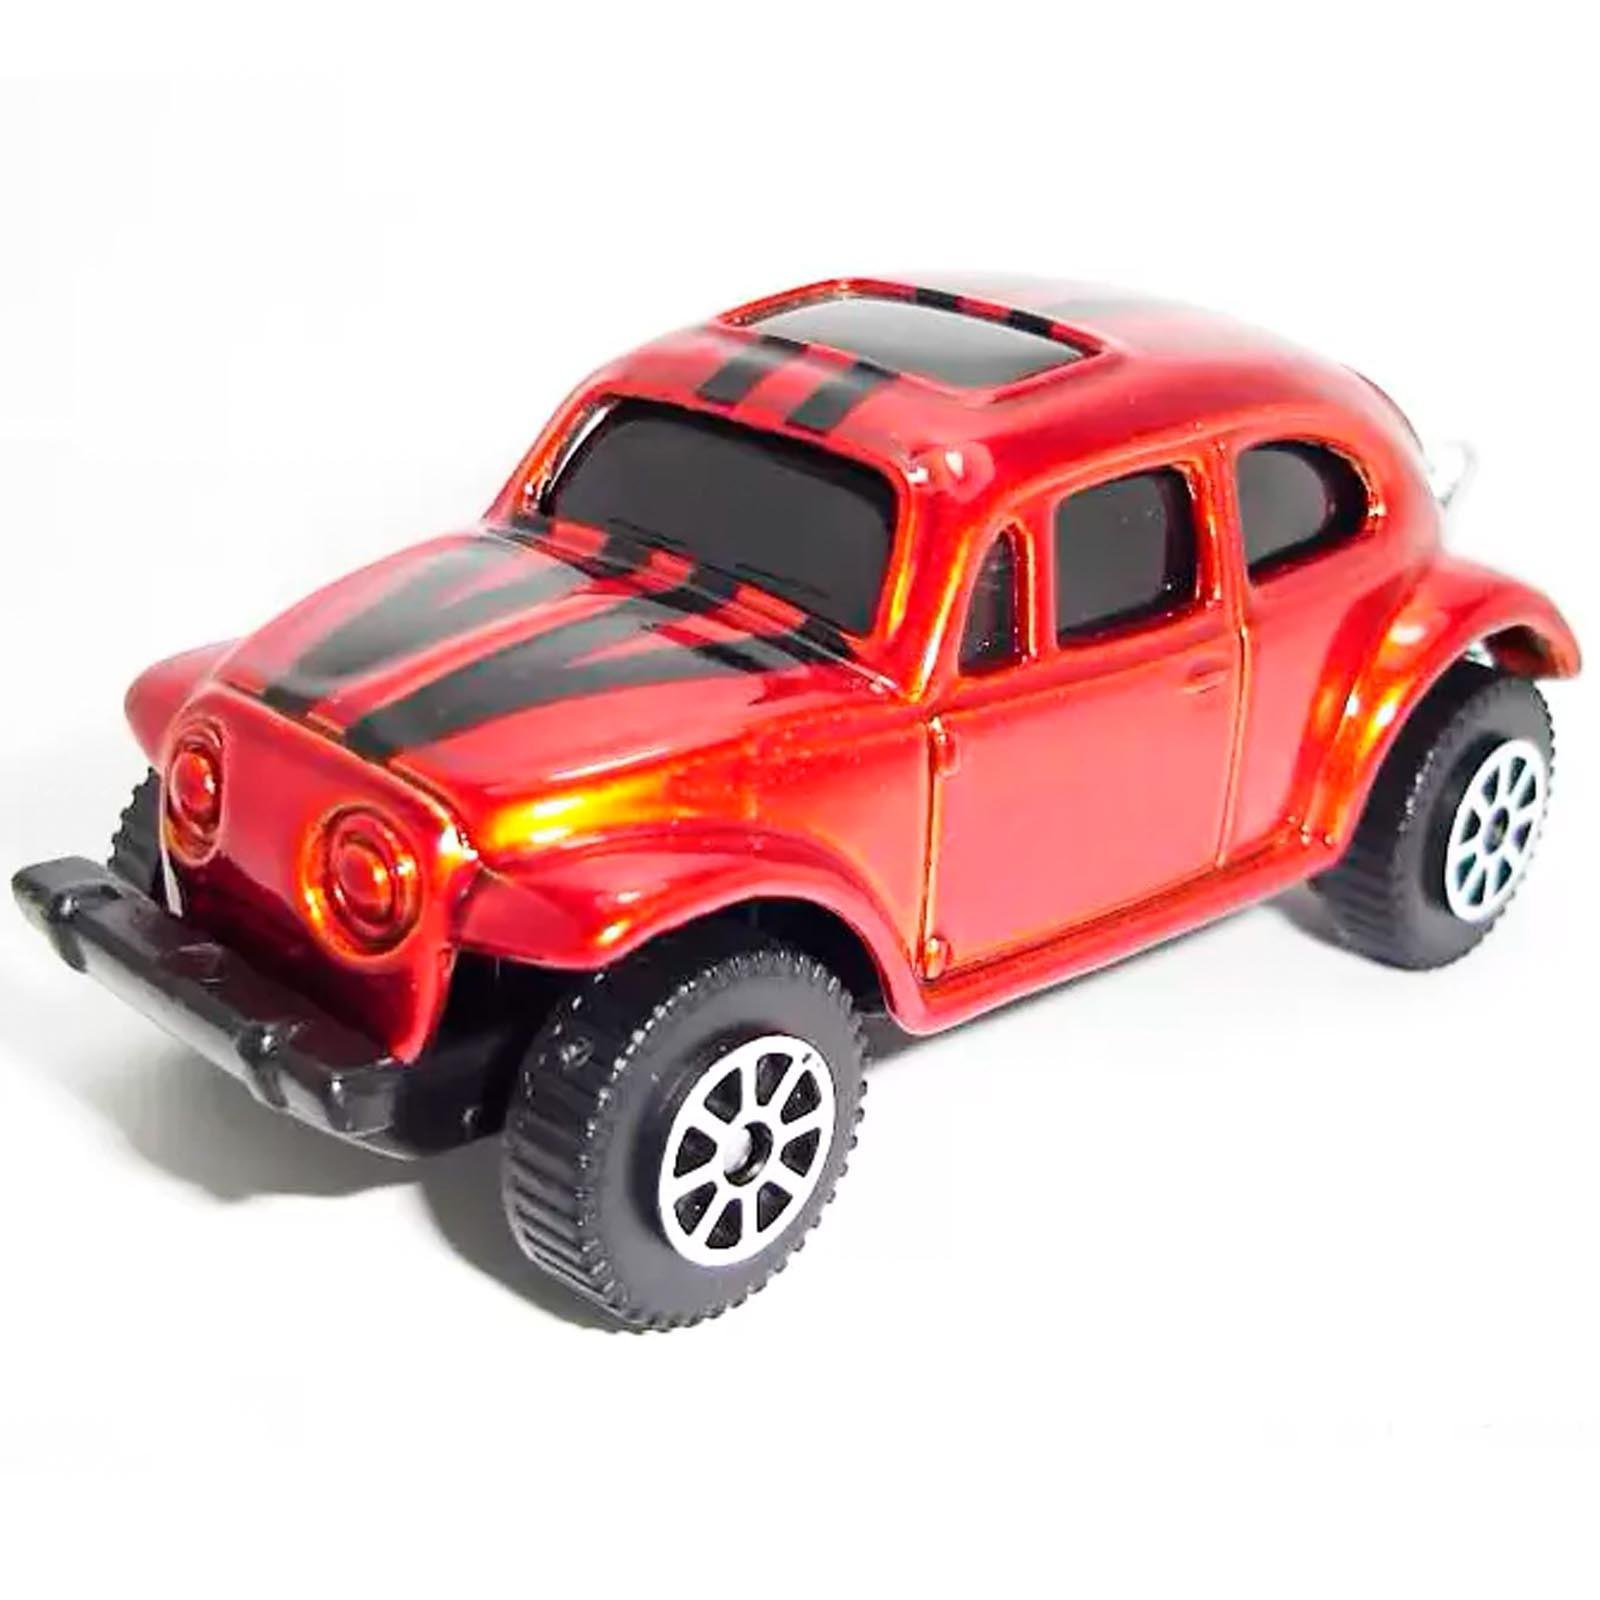 Miniatura - 1:64 - Volkswagen Beetle / Fusca Off Road - FreshMetal - Maisto